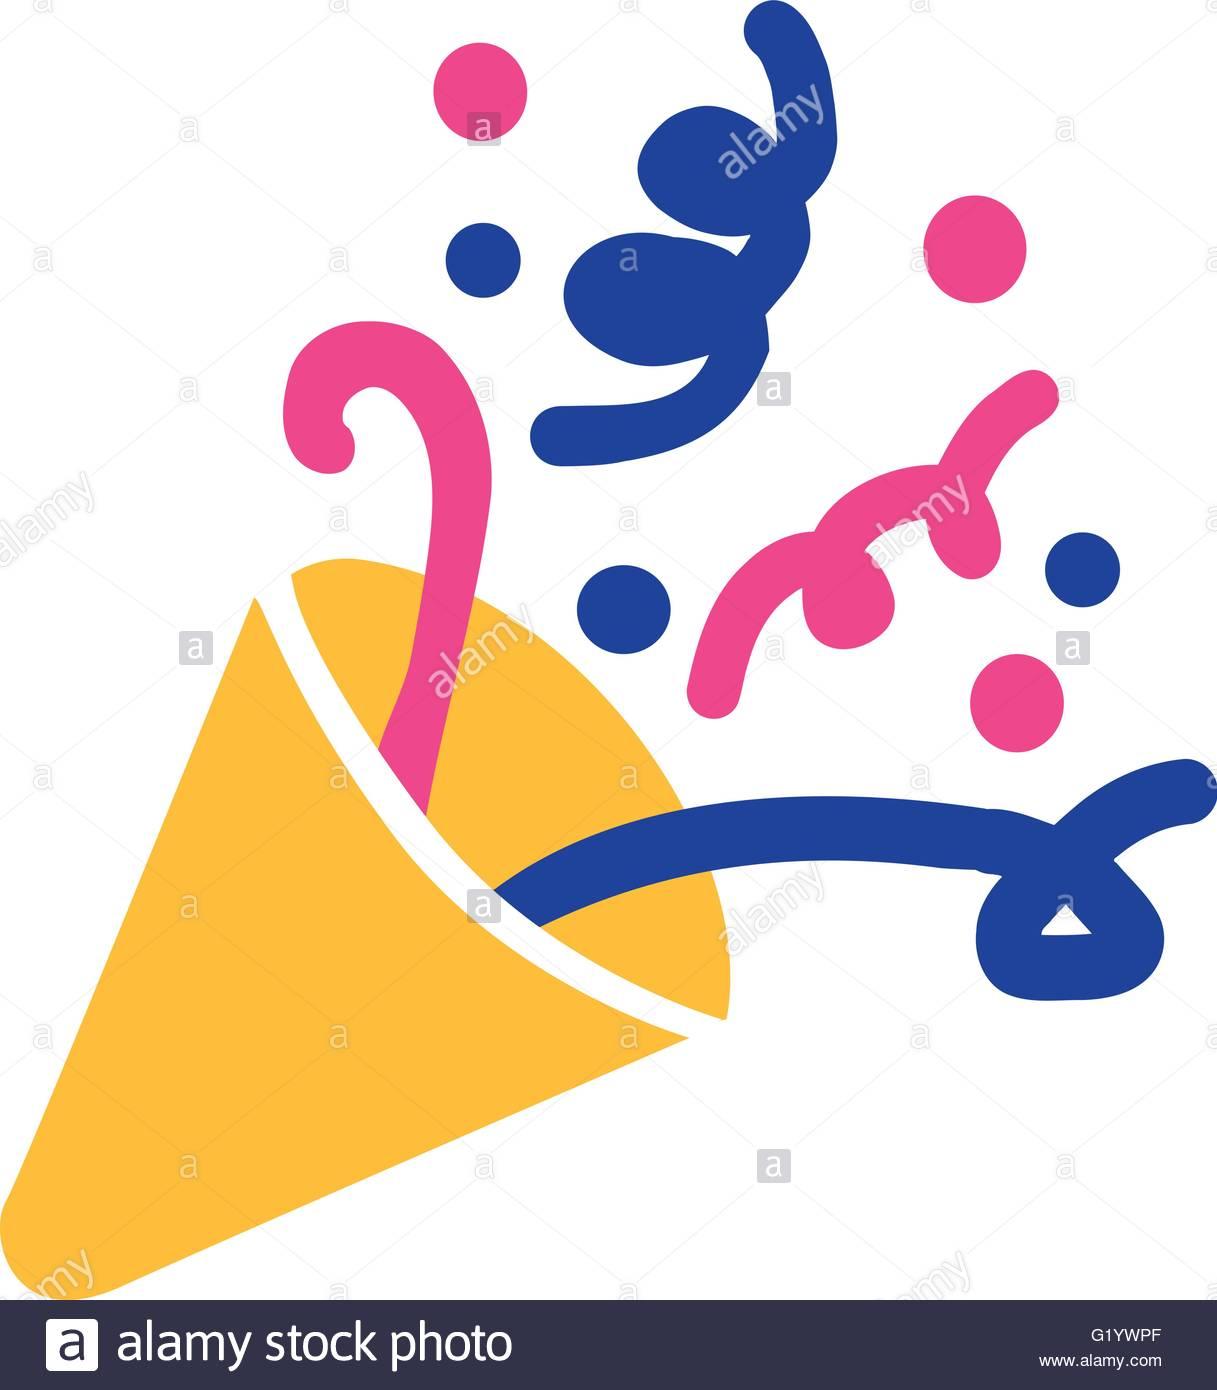 1217x1390 Party Horn Symbol Confetti Stock Vector Art Amp Illustration, Vector